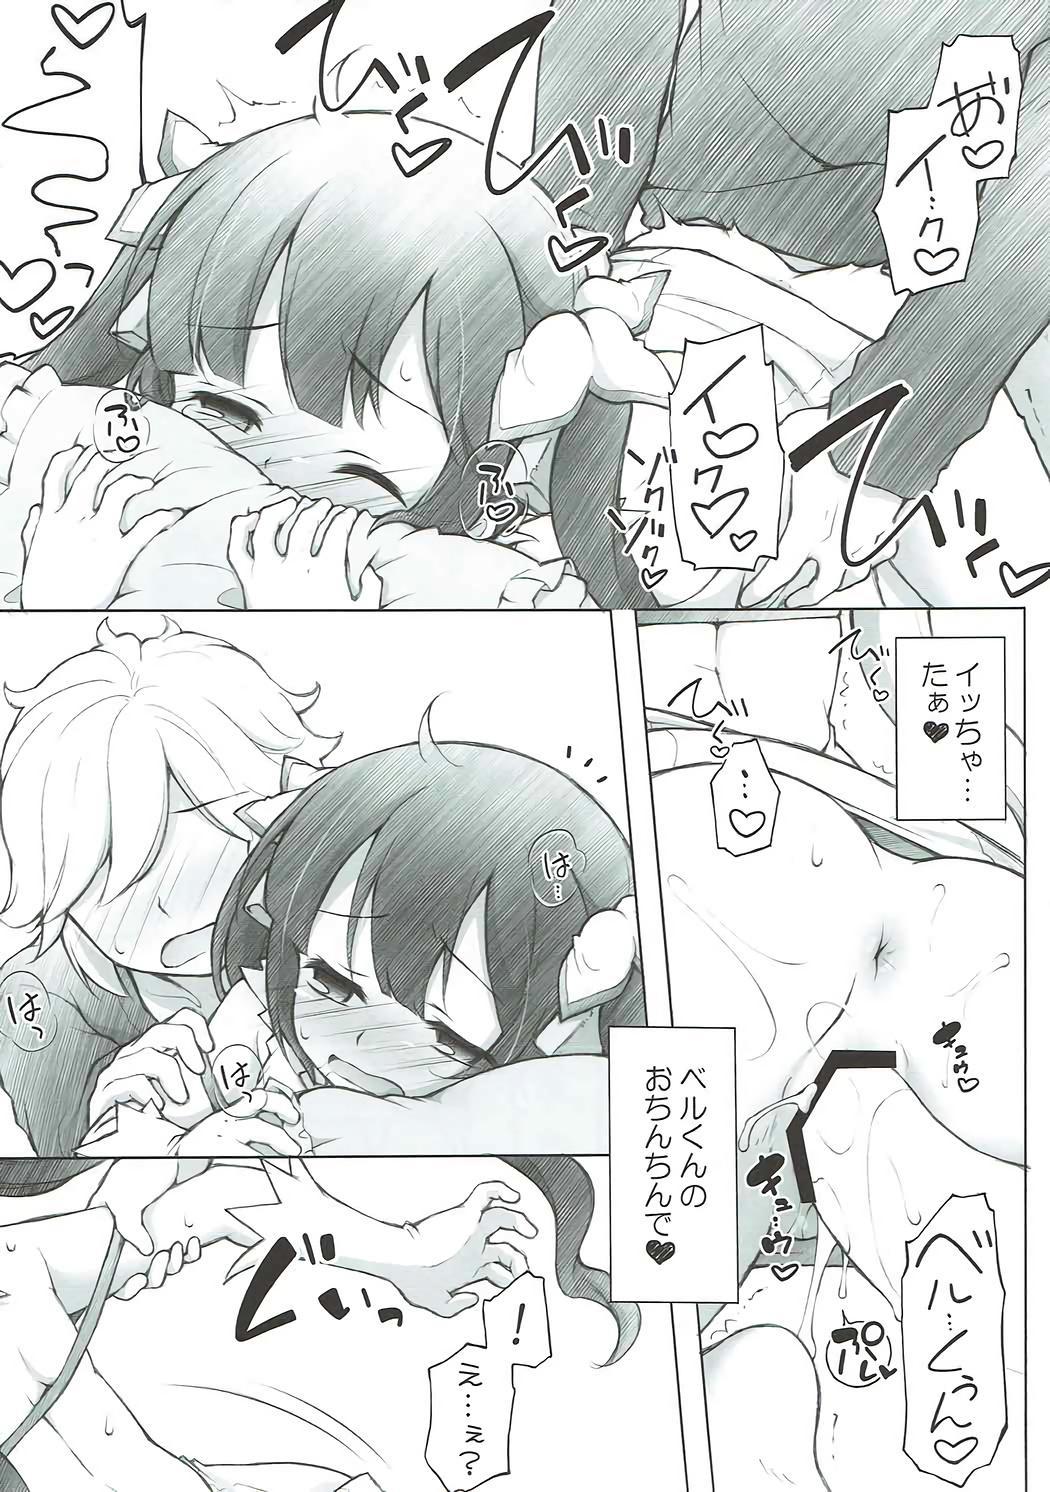 Loli Kamisama Familiax 11